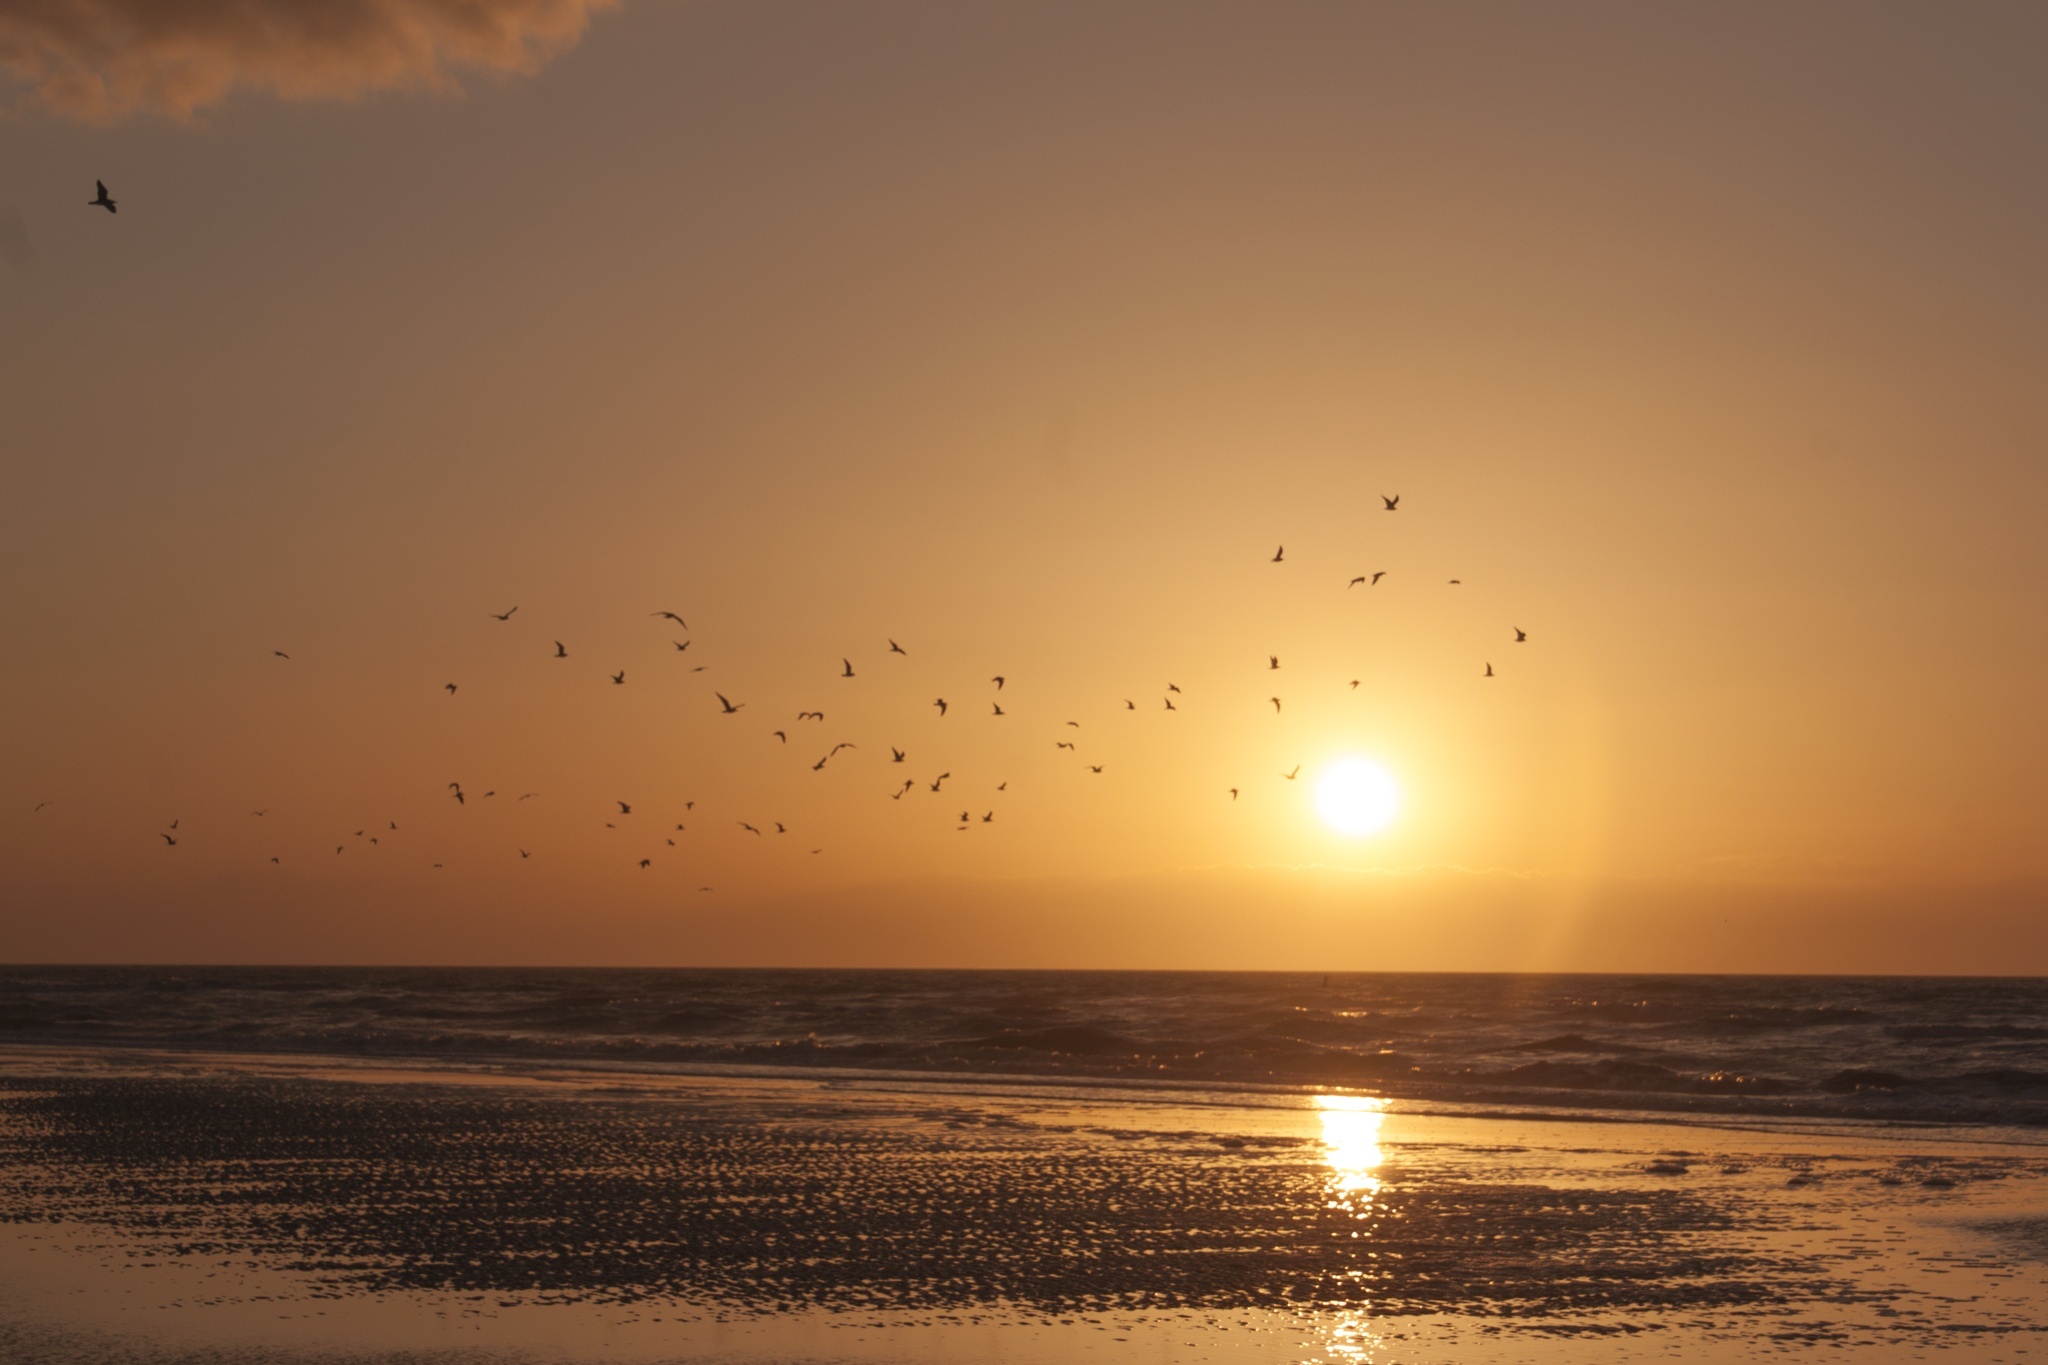 Sunset by Mie Vanmarcke